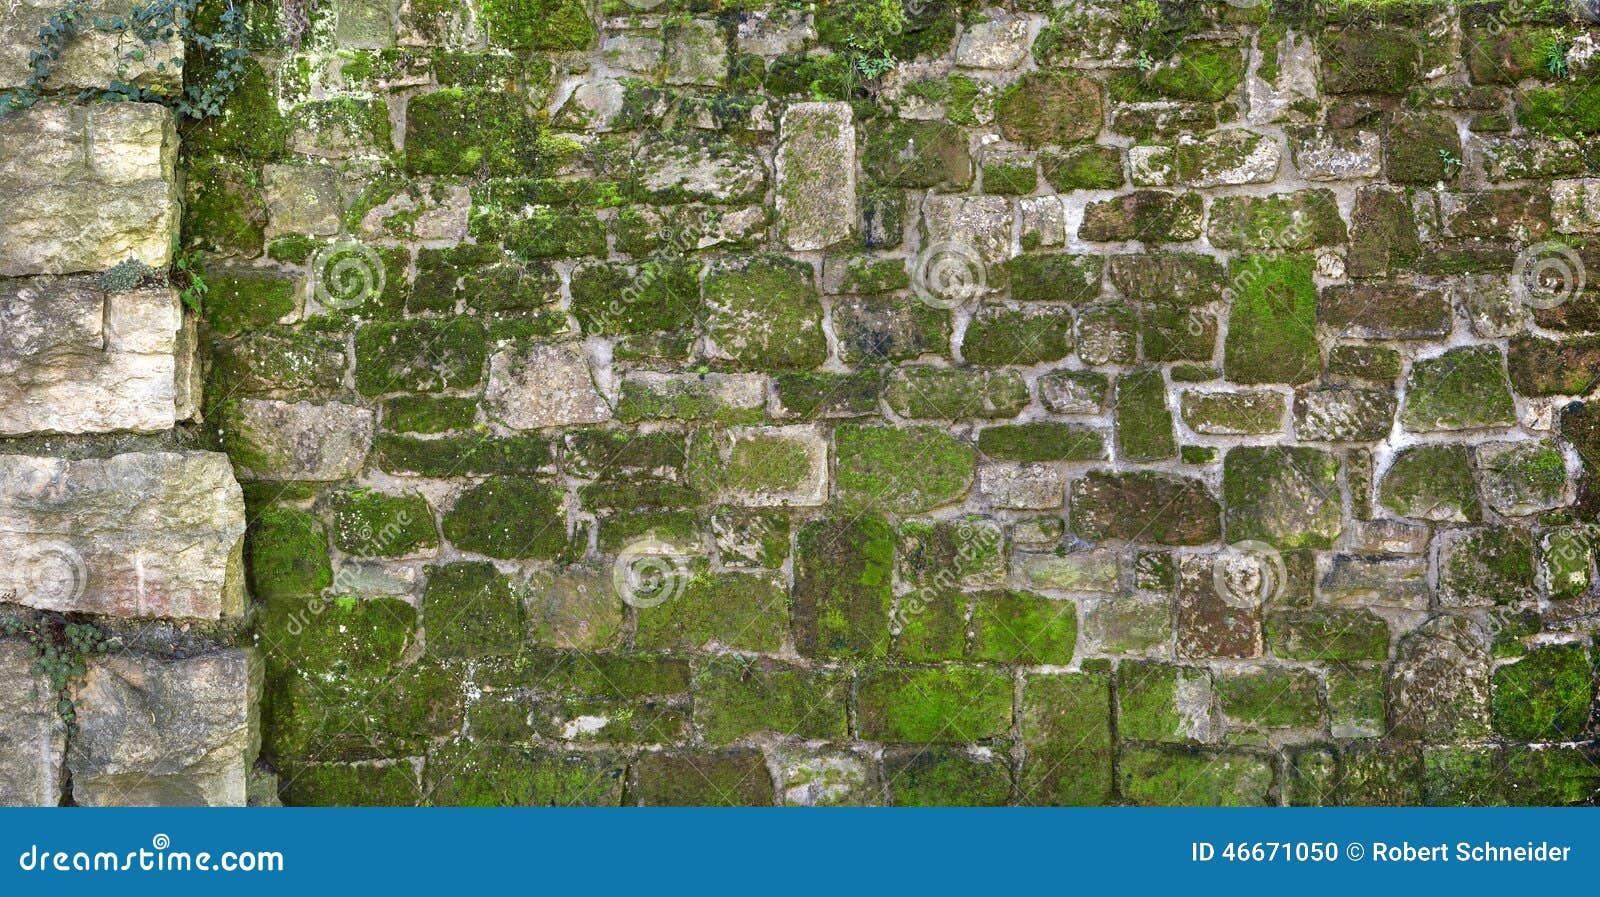 Moosige Alte Natursteinwand Stockfoto - Bild: 46671050